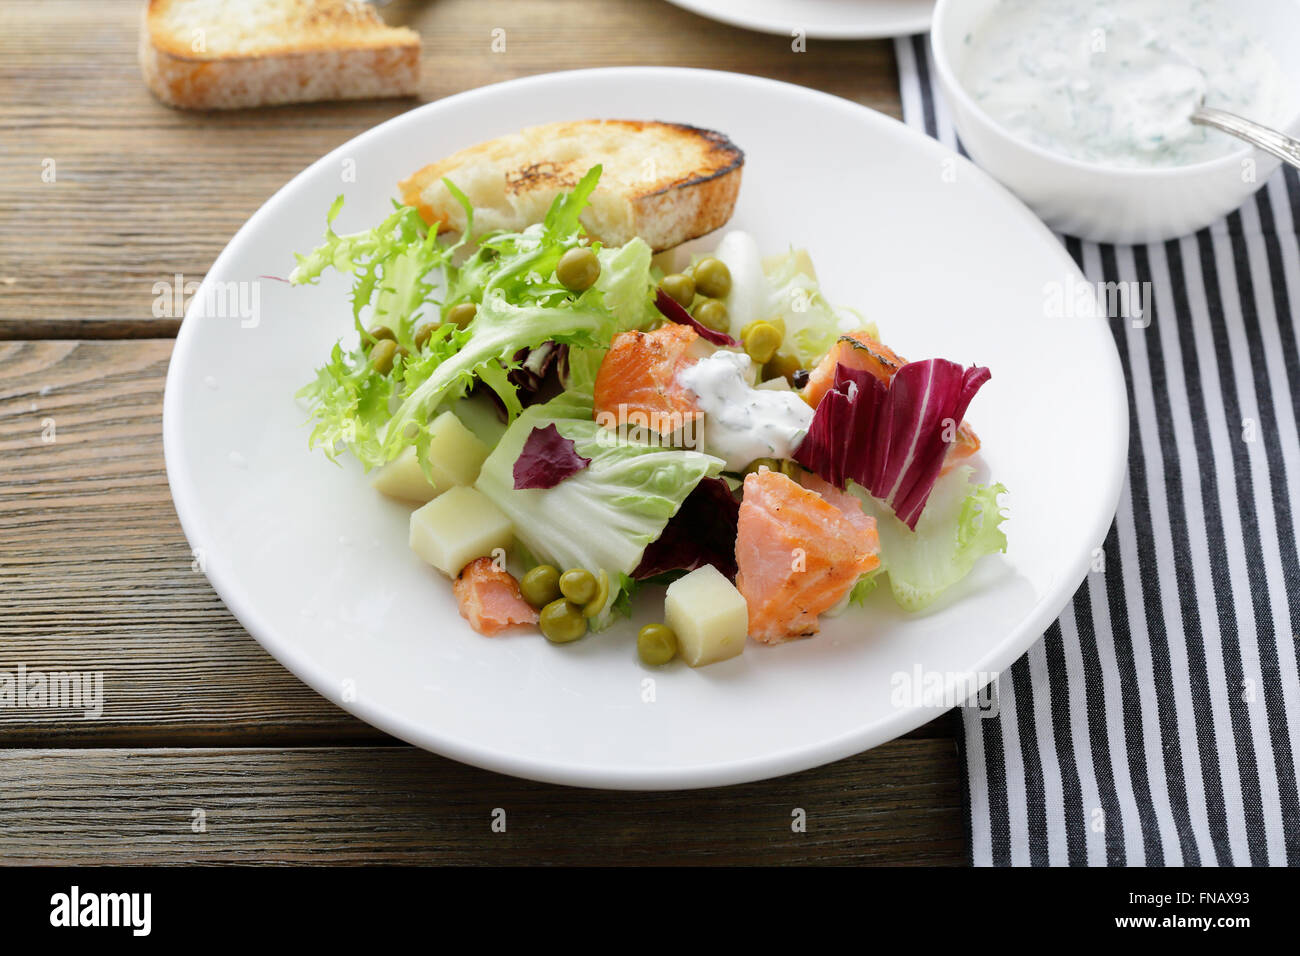 salad with baked fish, food closeup - Stock Image